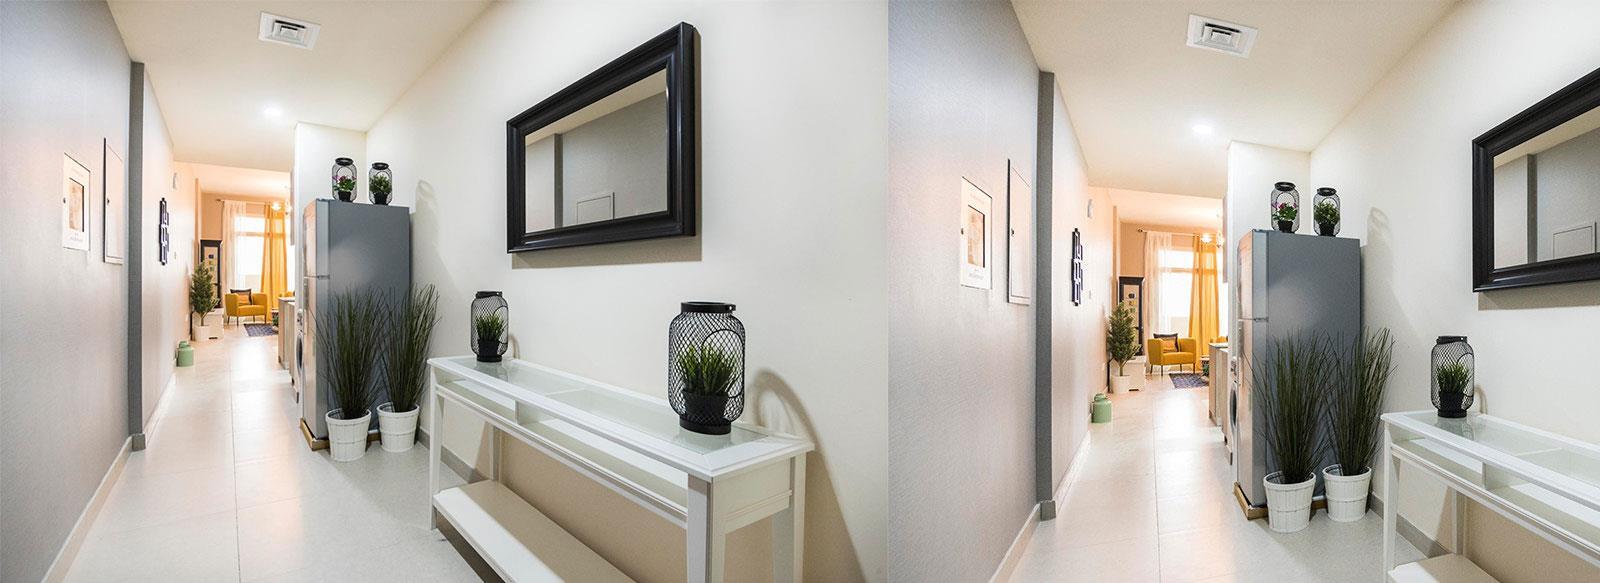 Al Falak Residence Dubai Silicon Oasis